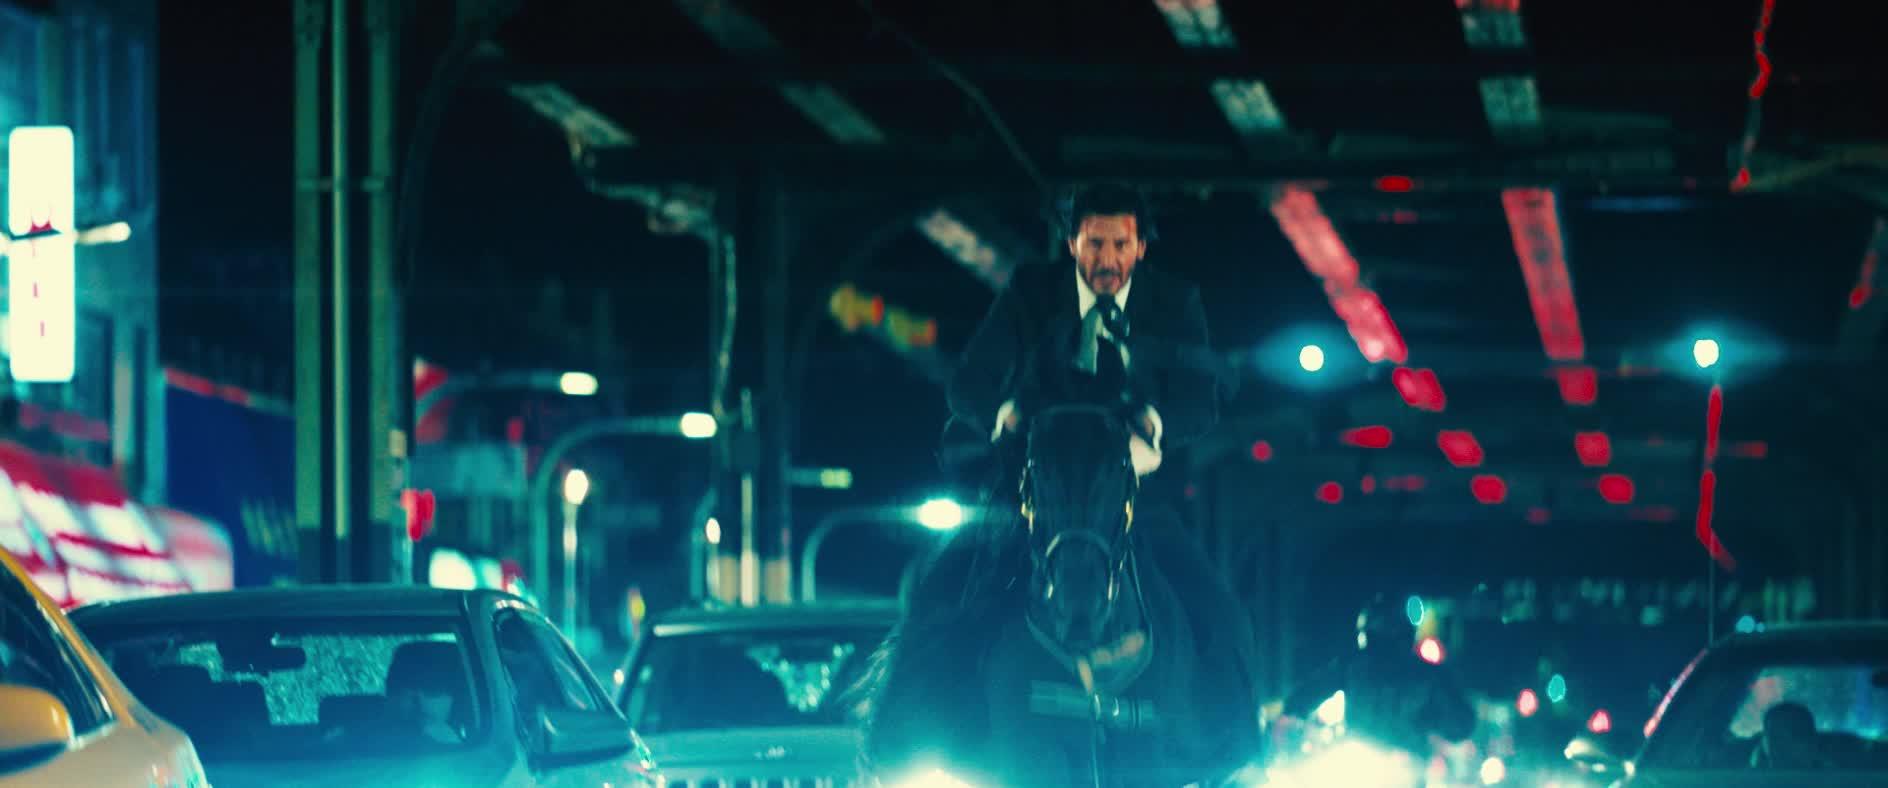 fight, horse, john wick, john wick 3, john wick chapter 3, john wick chapter 3 parabellum, keanu reeves, John Wick Keanu Reeves Horseback New York Streets GIFs